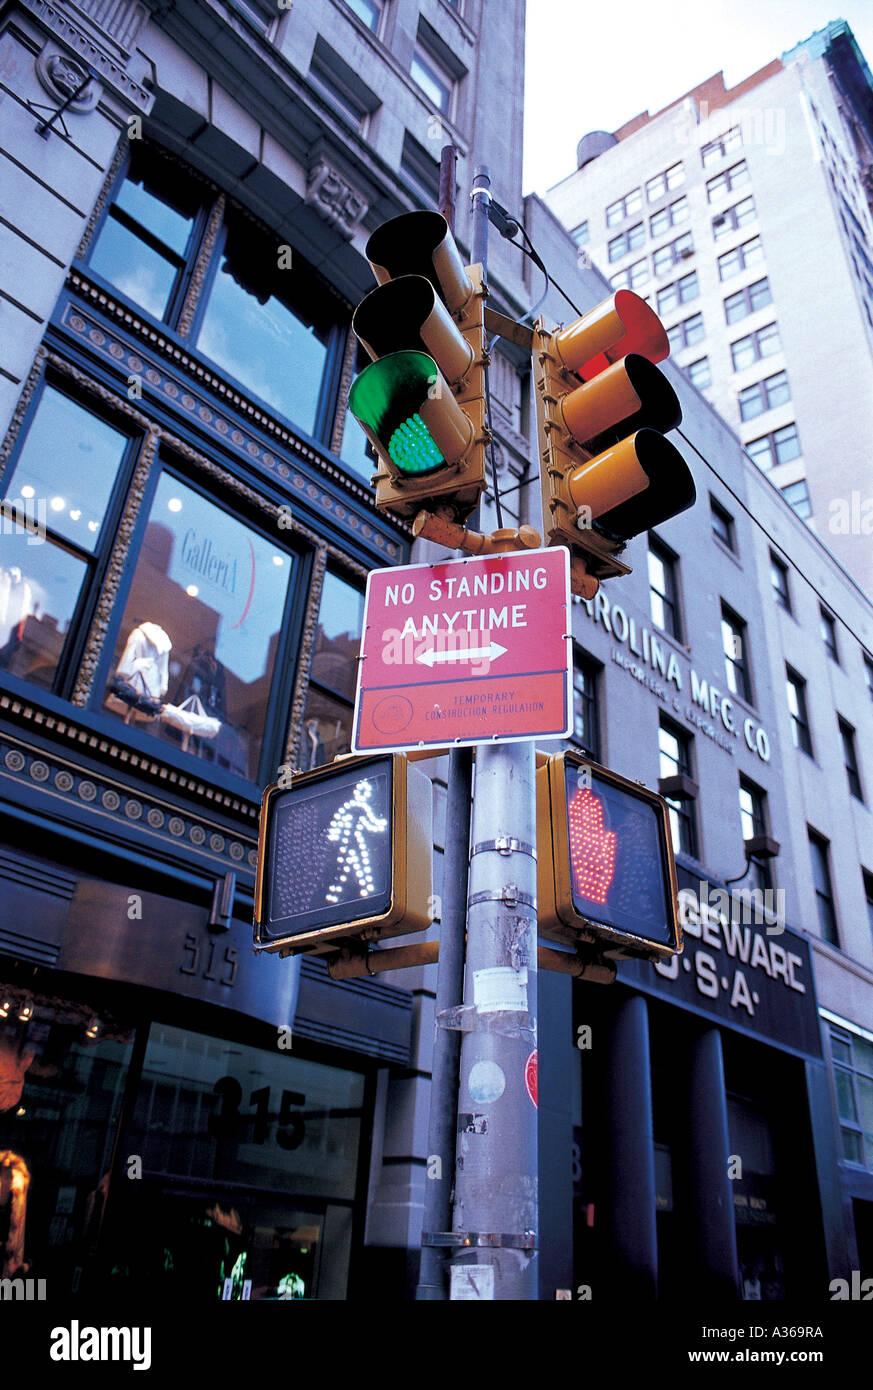 America,New York,signal lamp,light,traffic,communi Stock Photo